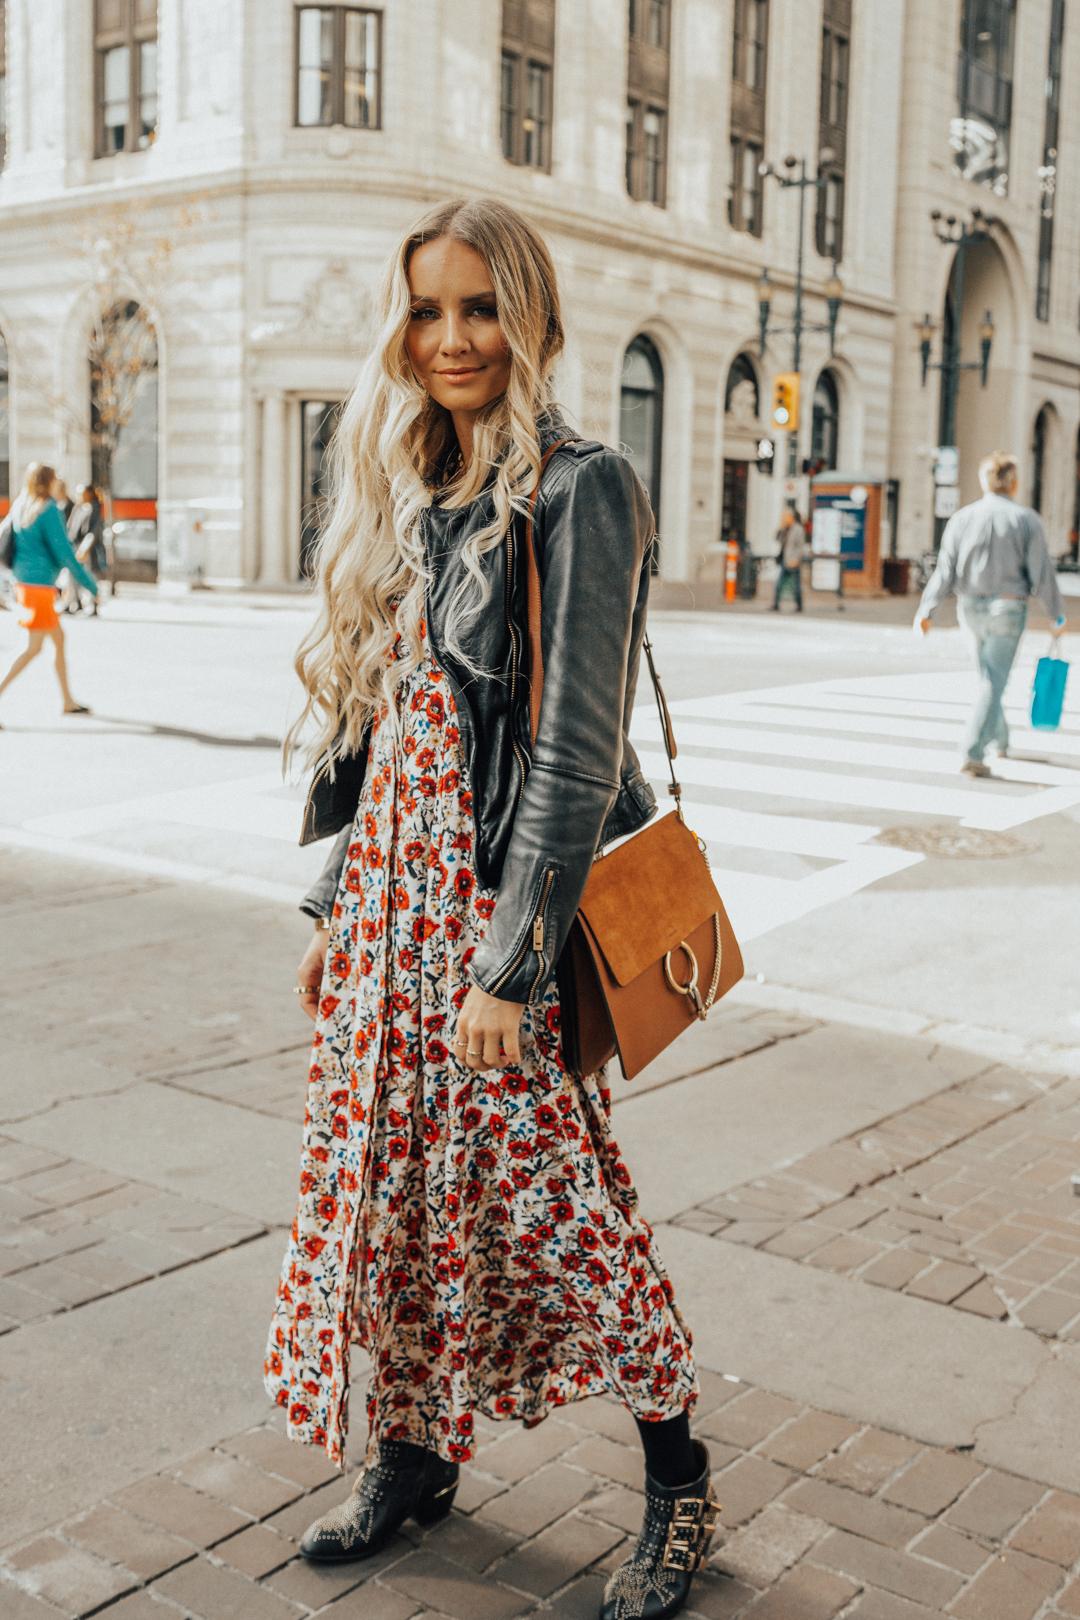 c787de29b01 Fall Autumn Outfit Floral Maxi Dress Leather Jacket CHloe Boots Chloe Bag-17